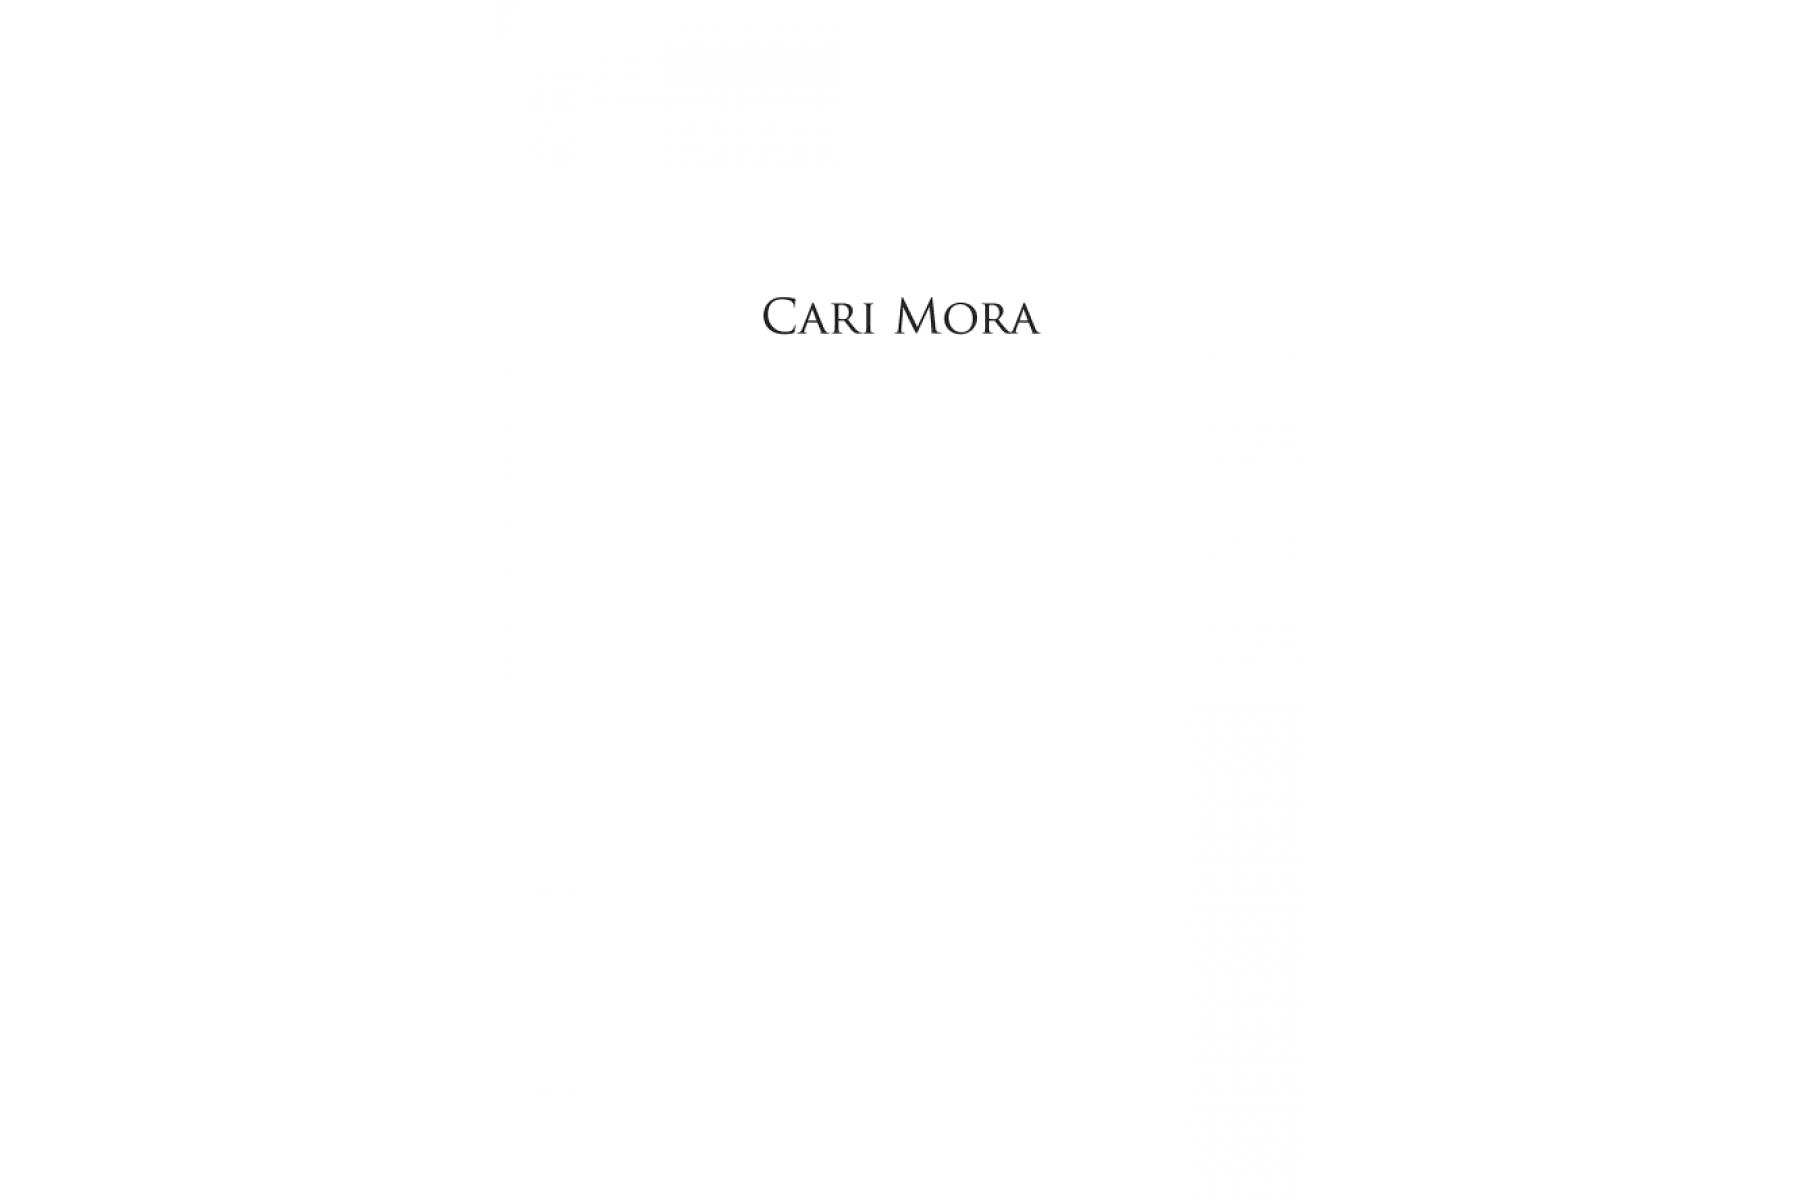 Cari Mora